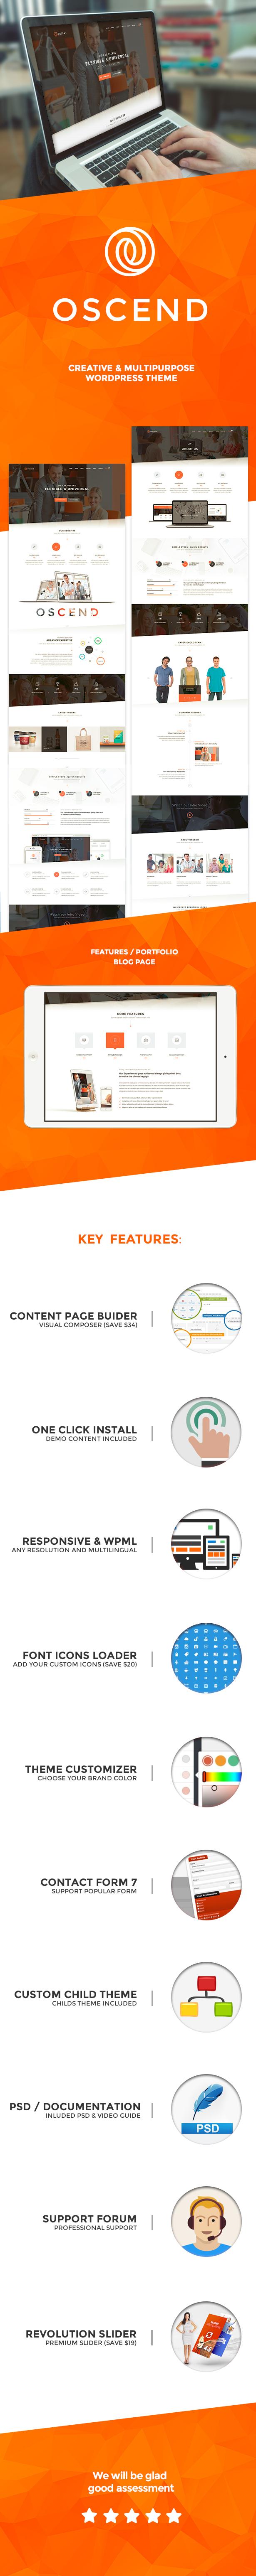 Oscend pluse - WordPress  Theme - 1